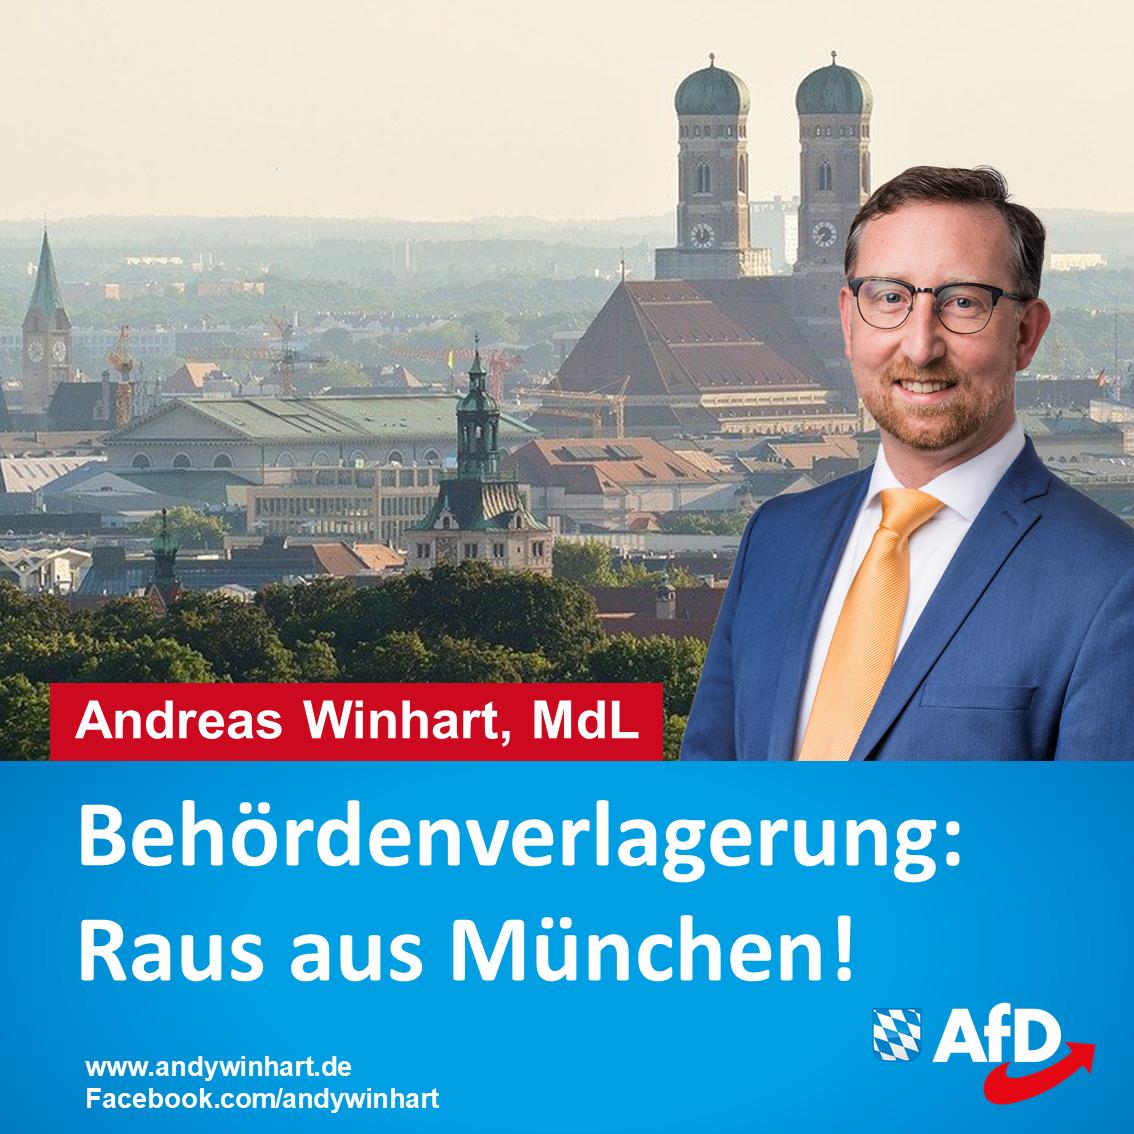 Andreas Winhart MdL begrüßt Behördenverlagerungen